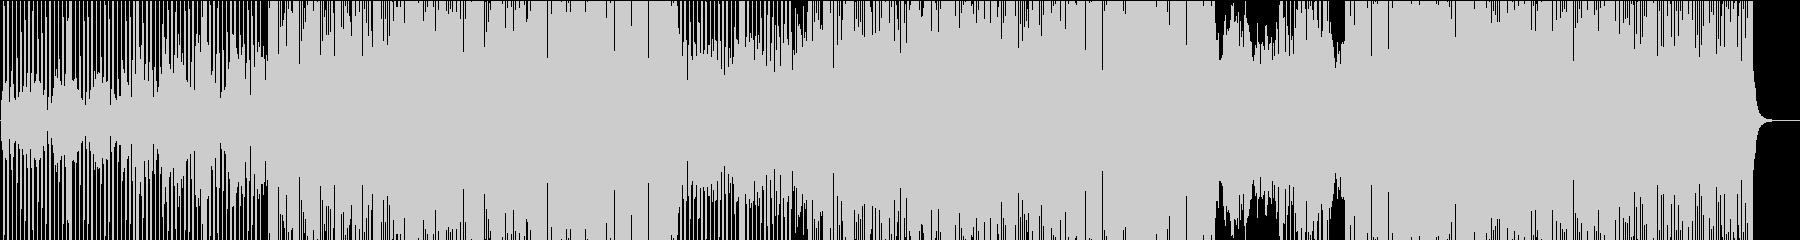 Succubus feat.Kvi Baba (grooveman Spot Remix)の未再生の波形